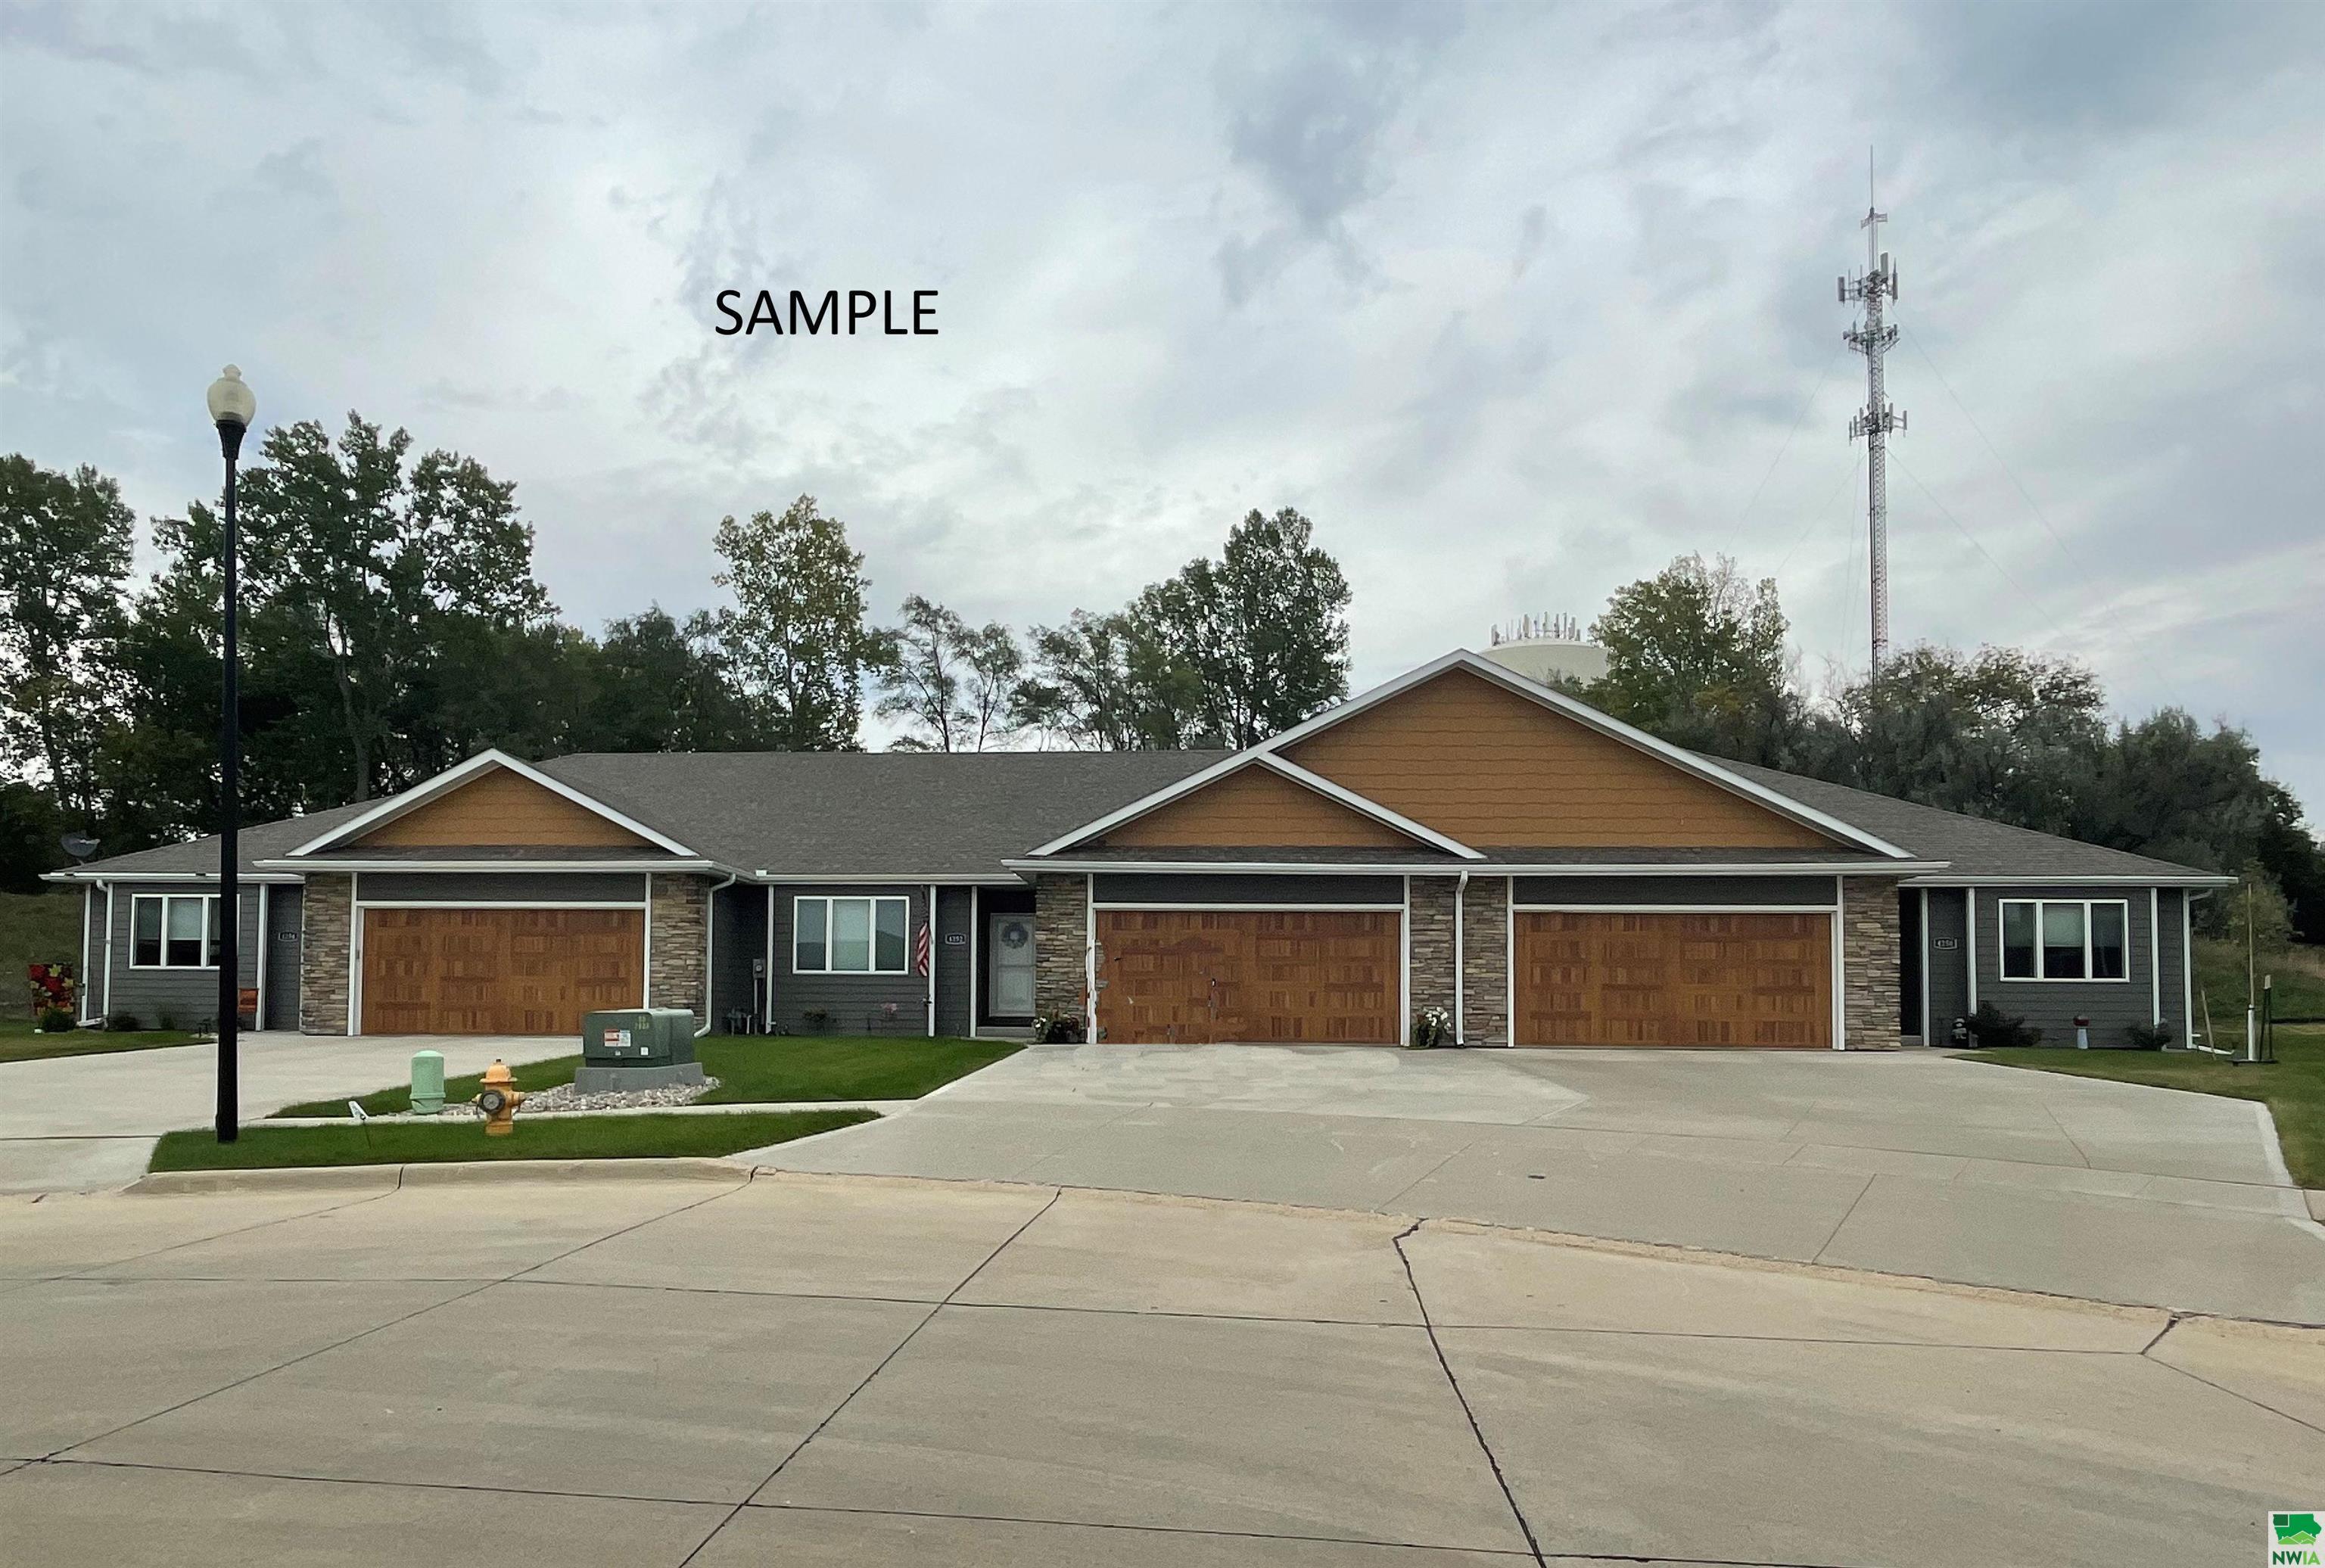 4233 Fremar Drive, Sioux City, Iowa 51104